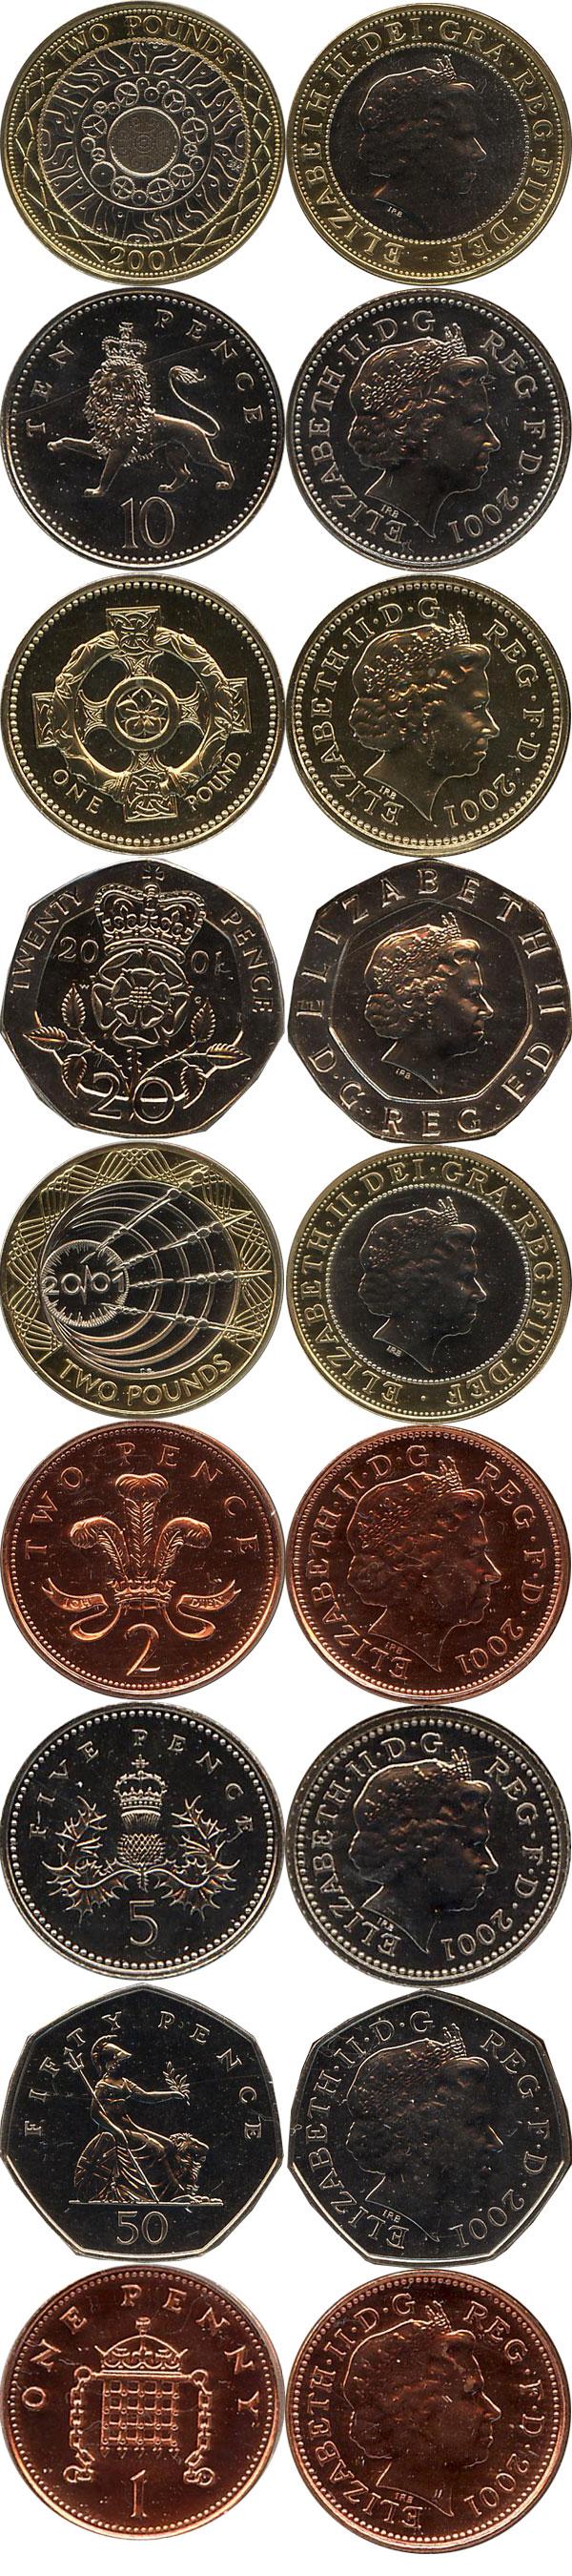 Набор монет Великобритания Годовой набор 2001 2001 UNC фото 2